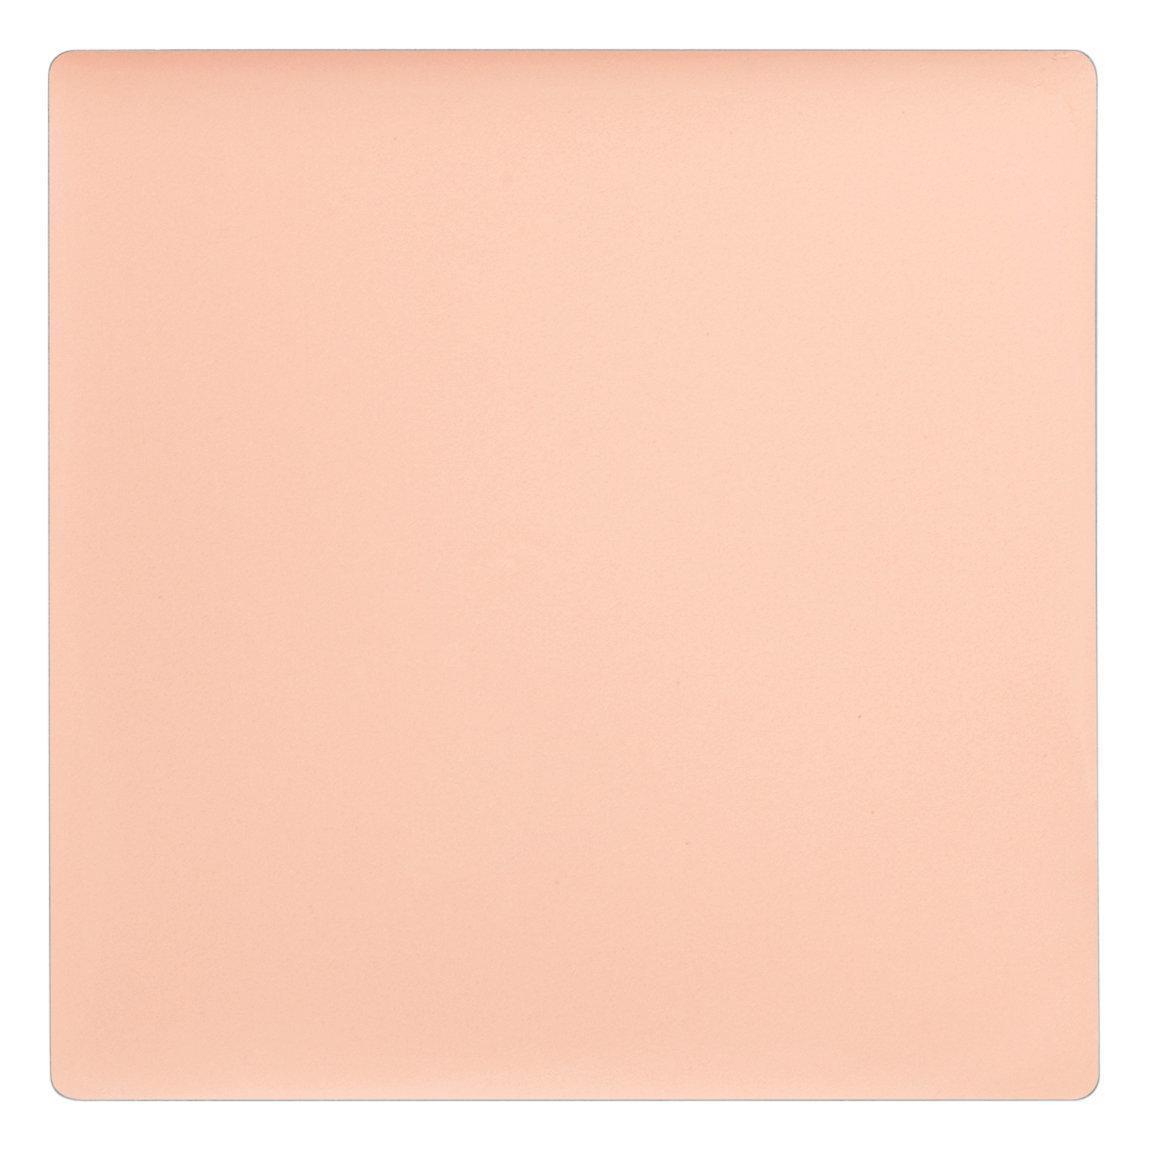 Kjaer Weis Cream Foundation Refill Lightness alternative view 1.